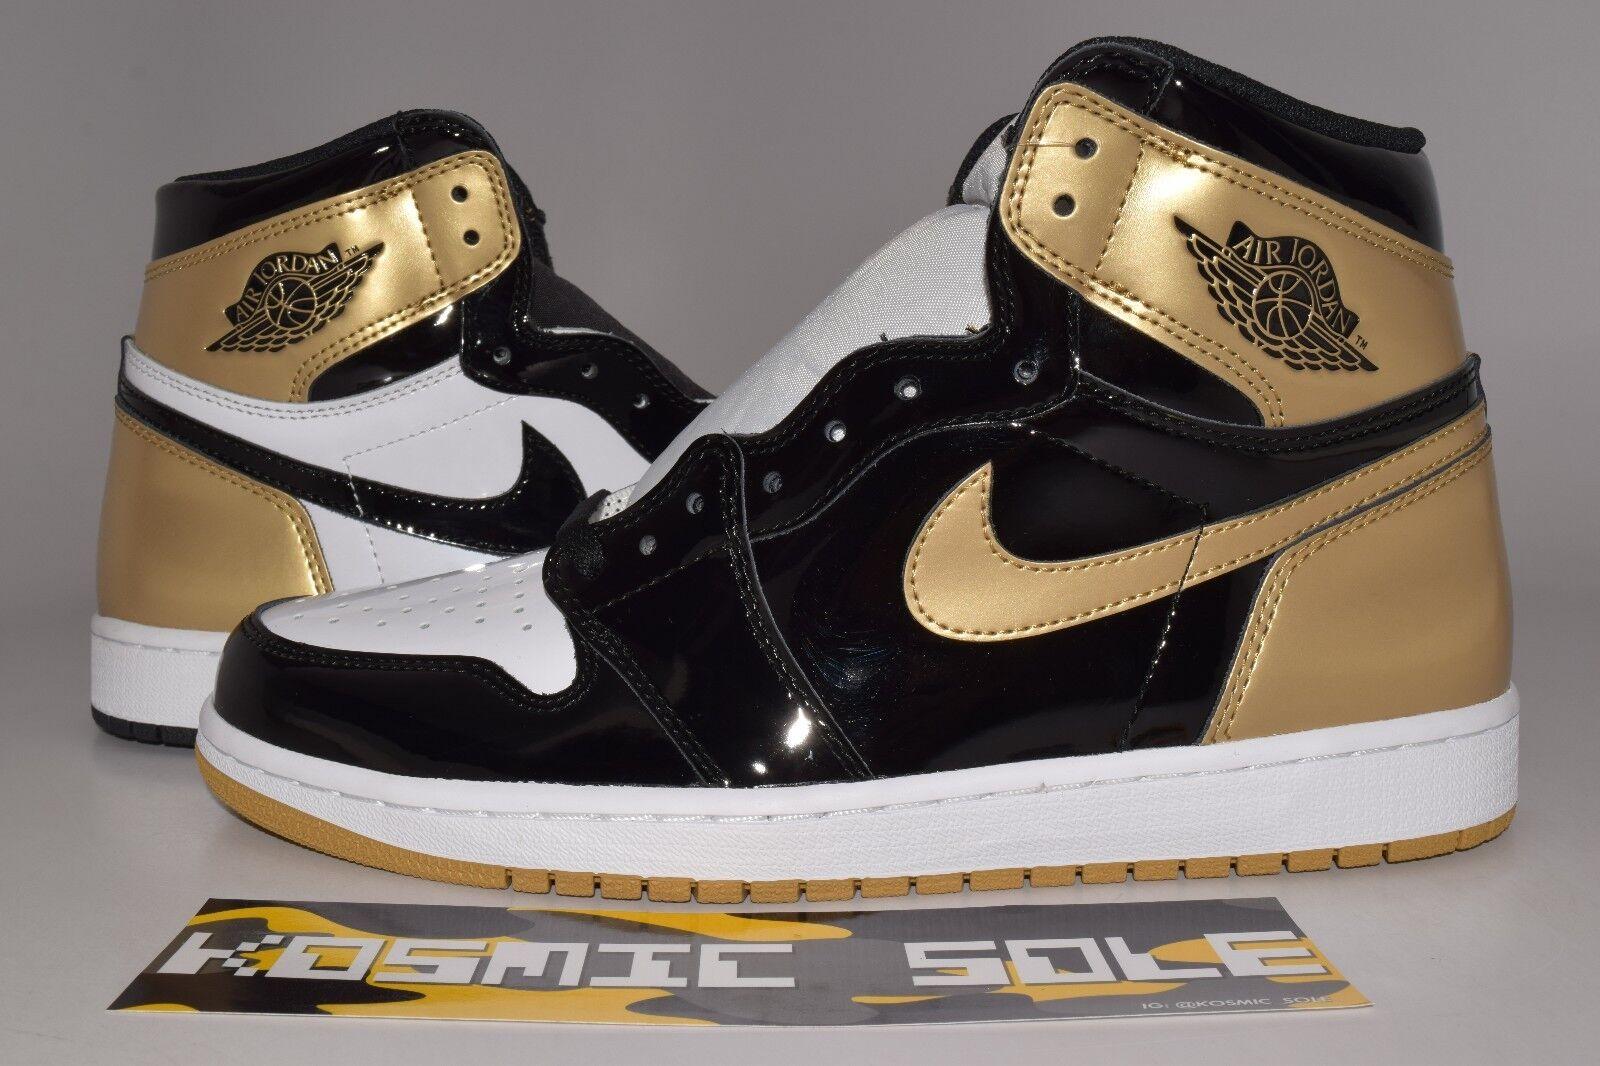 Nike air jordan 1 retro - top 3 gold - größe.